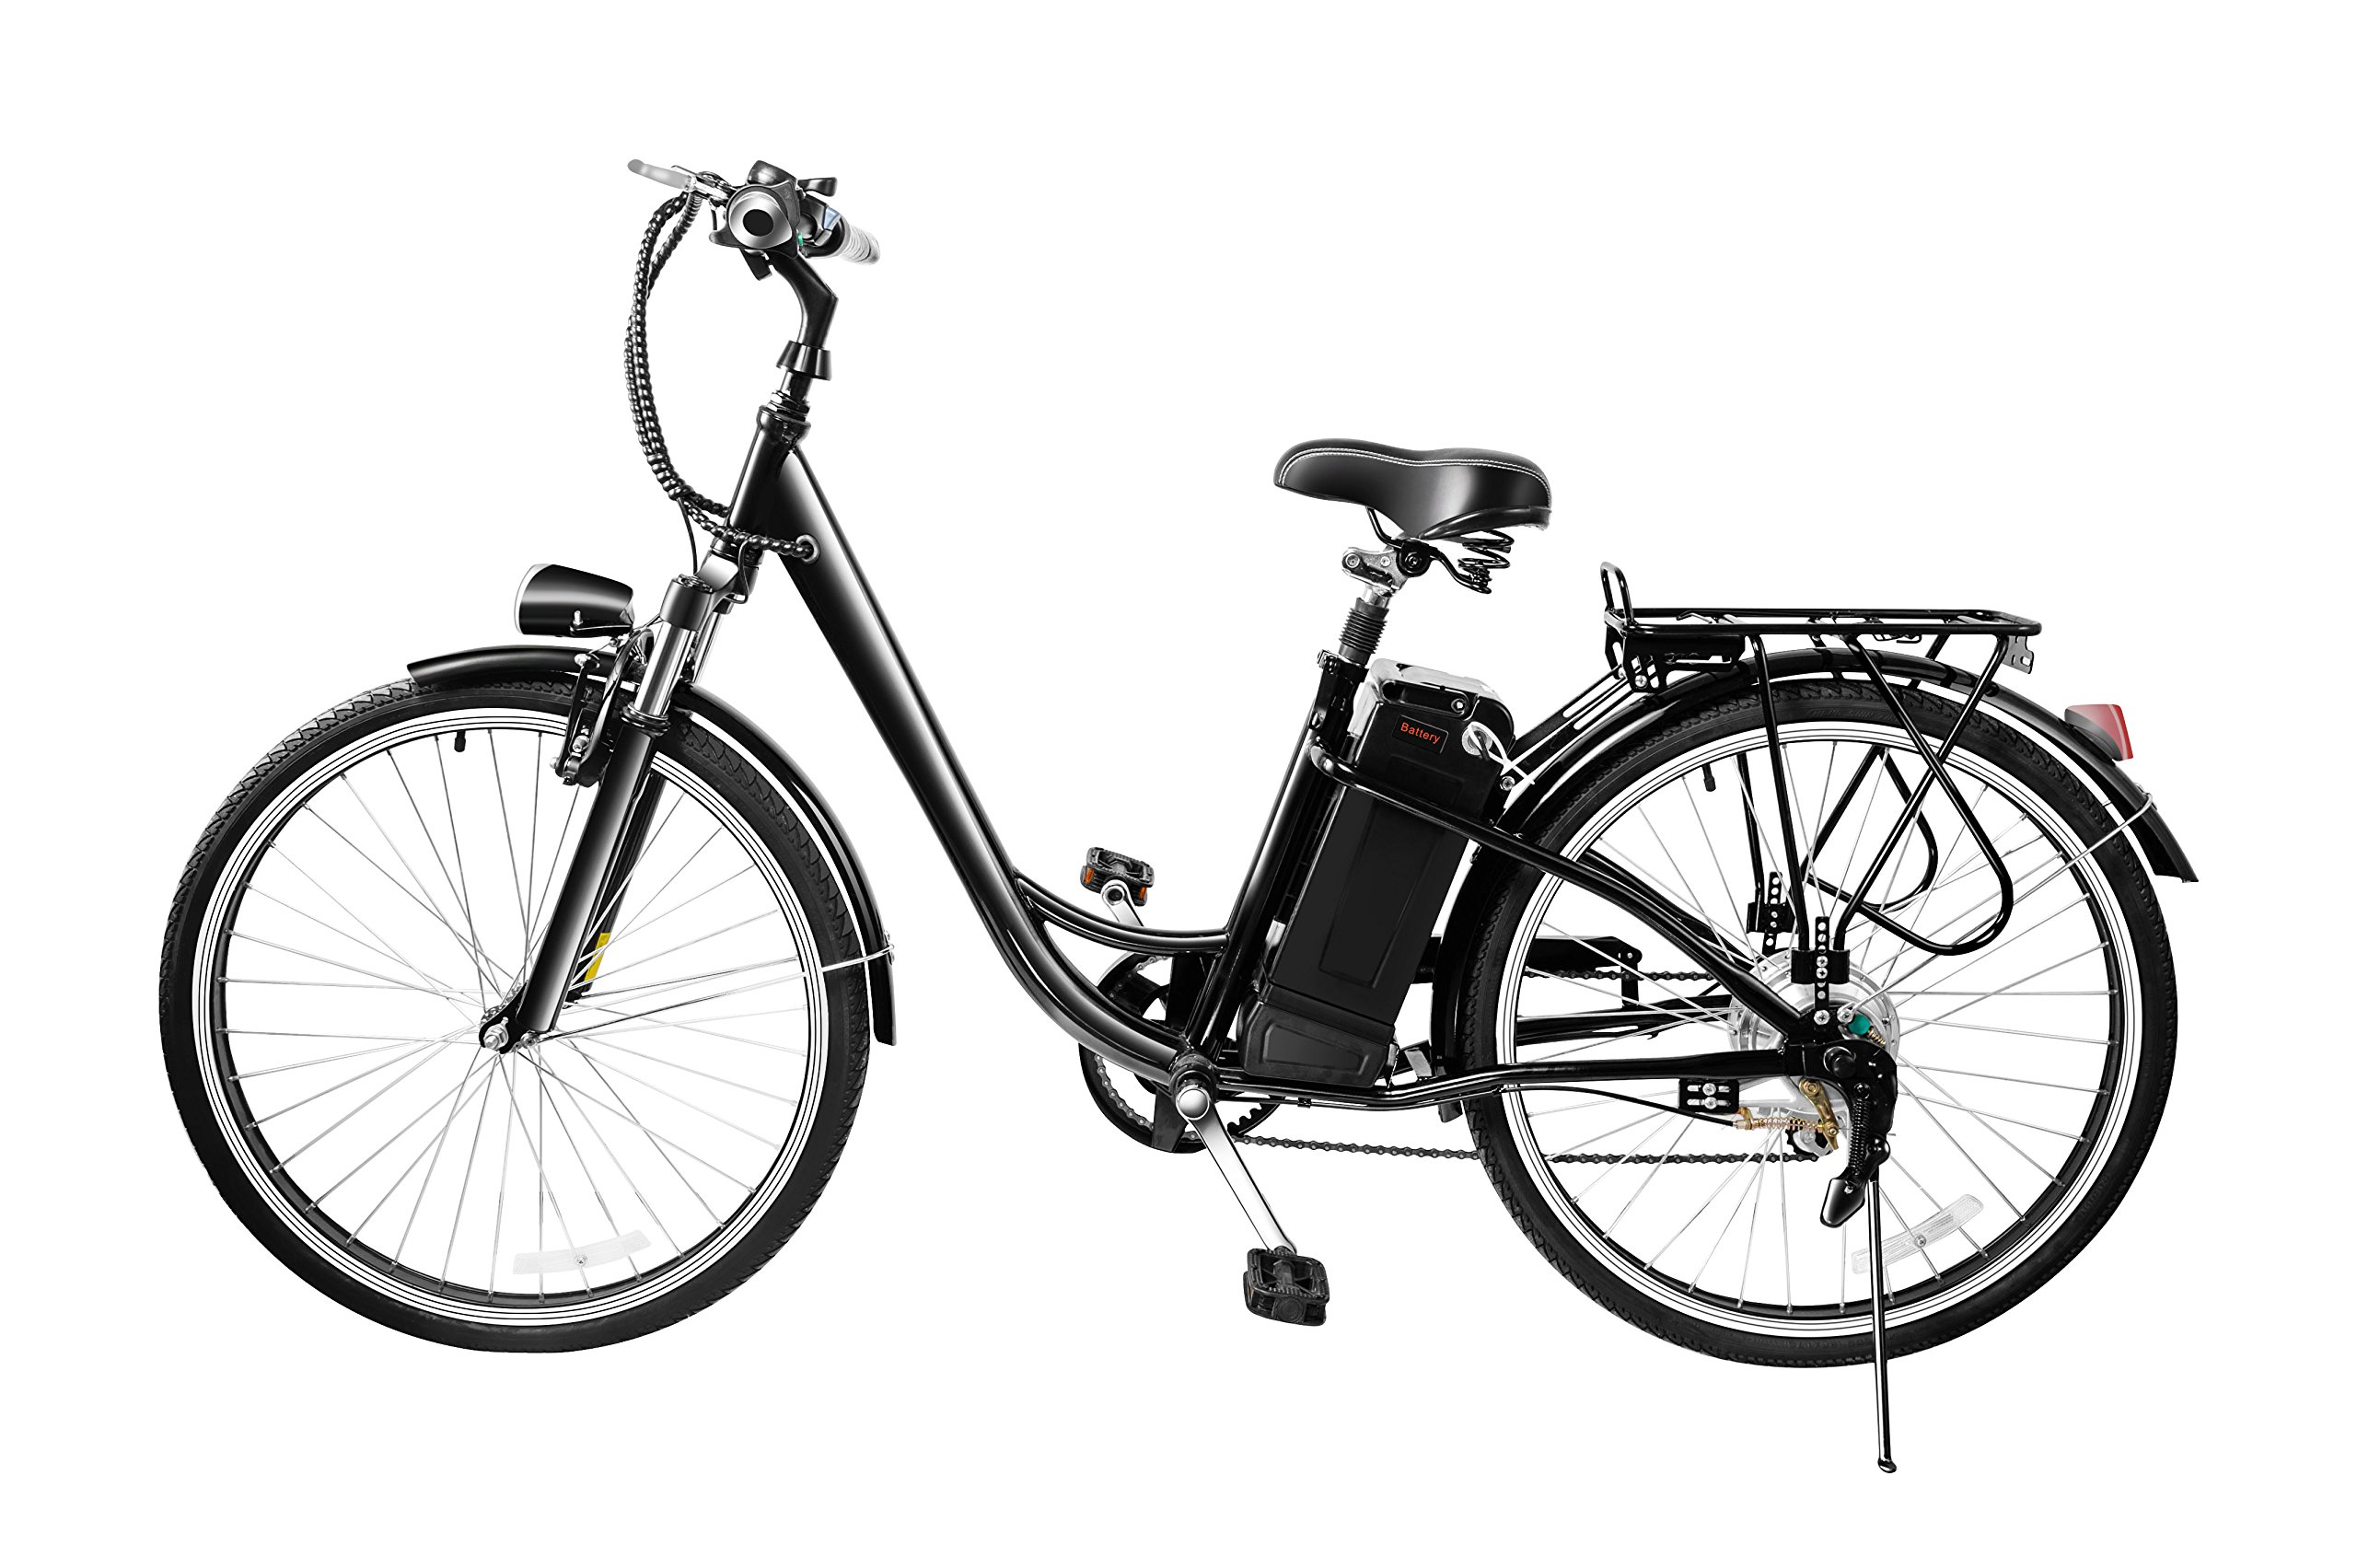 VEEKO 26'' City Electric Bicycle Ebike with 36V 10Ah Lithium Battery by VEEKO (Image #2)